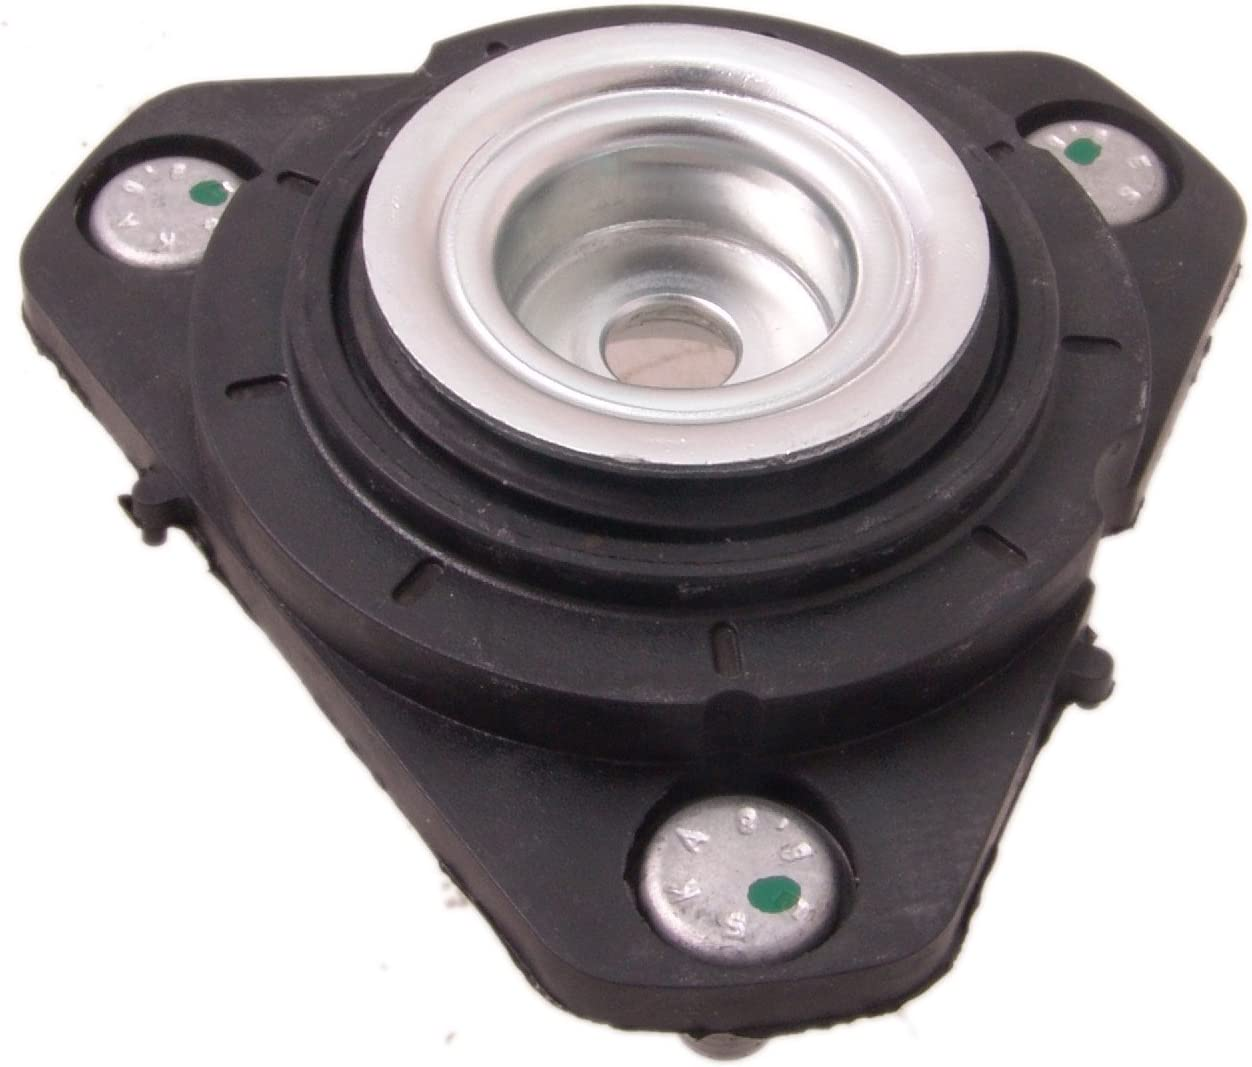 51920Smge01 - Overseas parallel import regular item Front Shock Absorber Honda Houston Mall For Febest Support